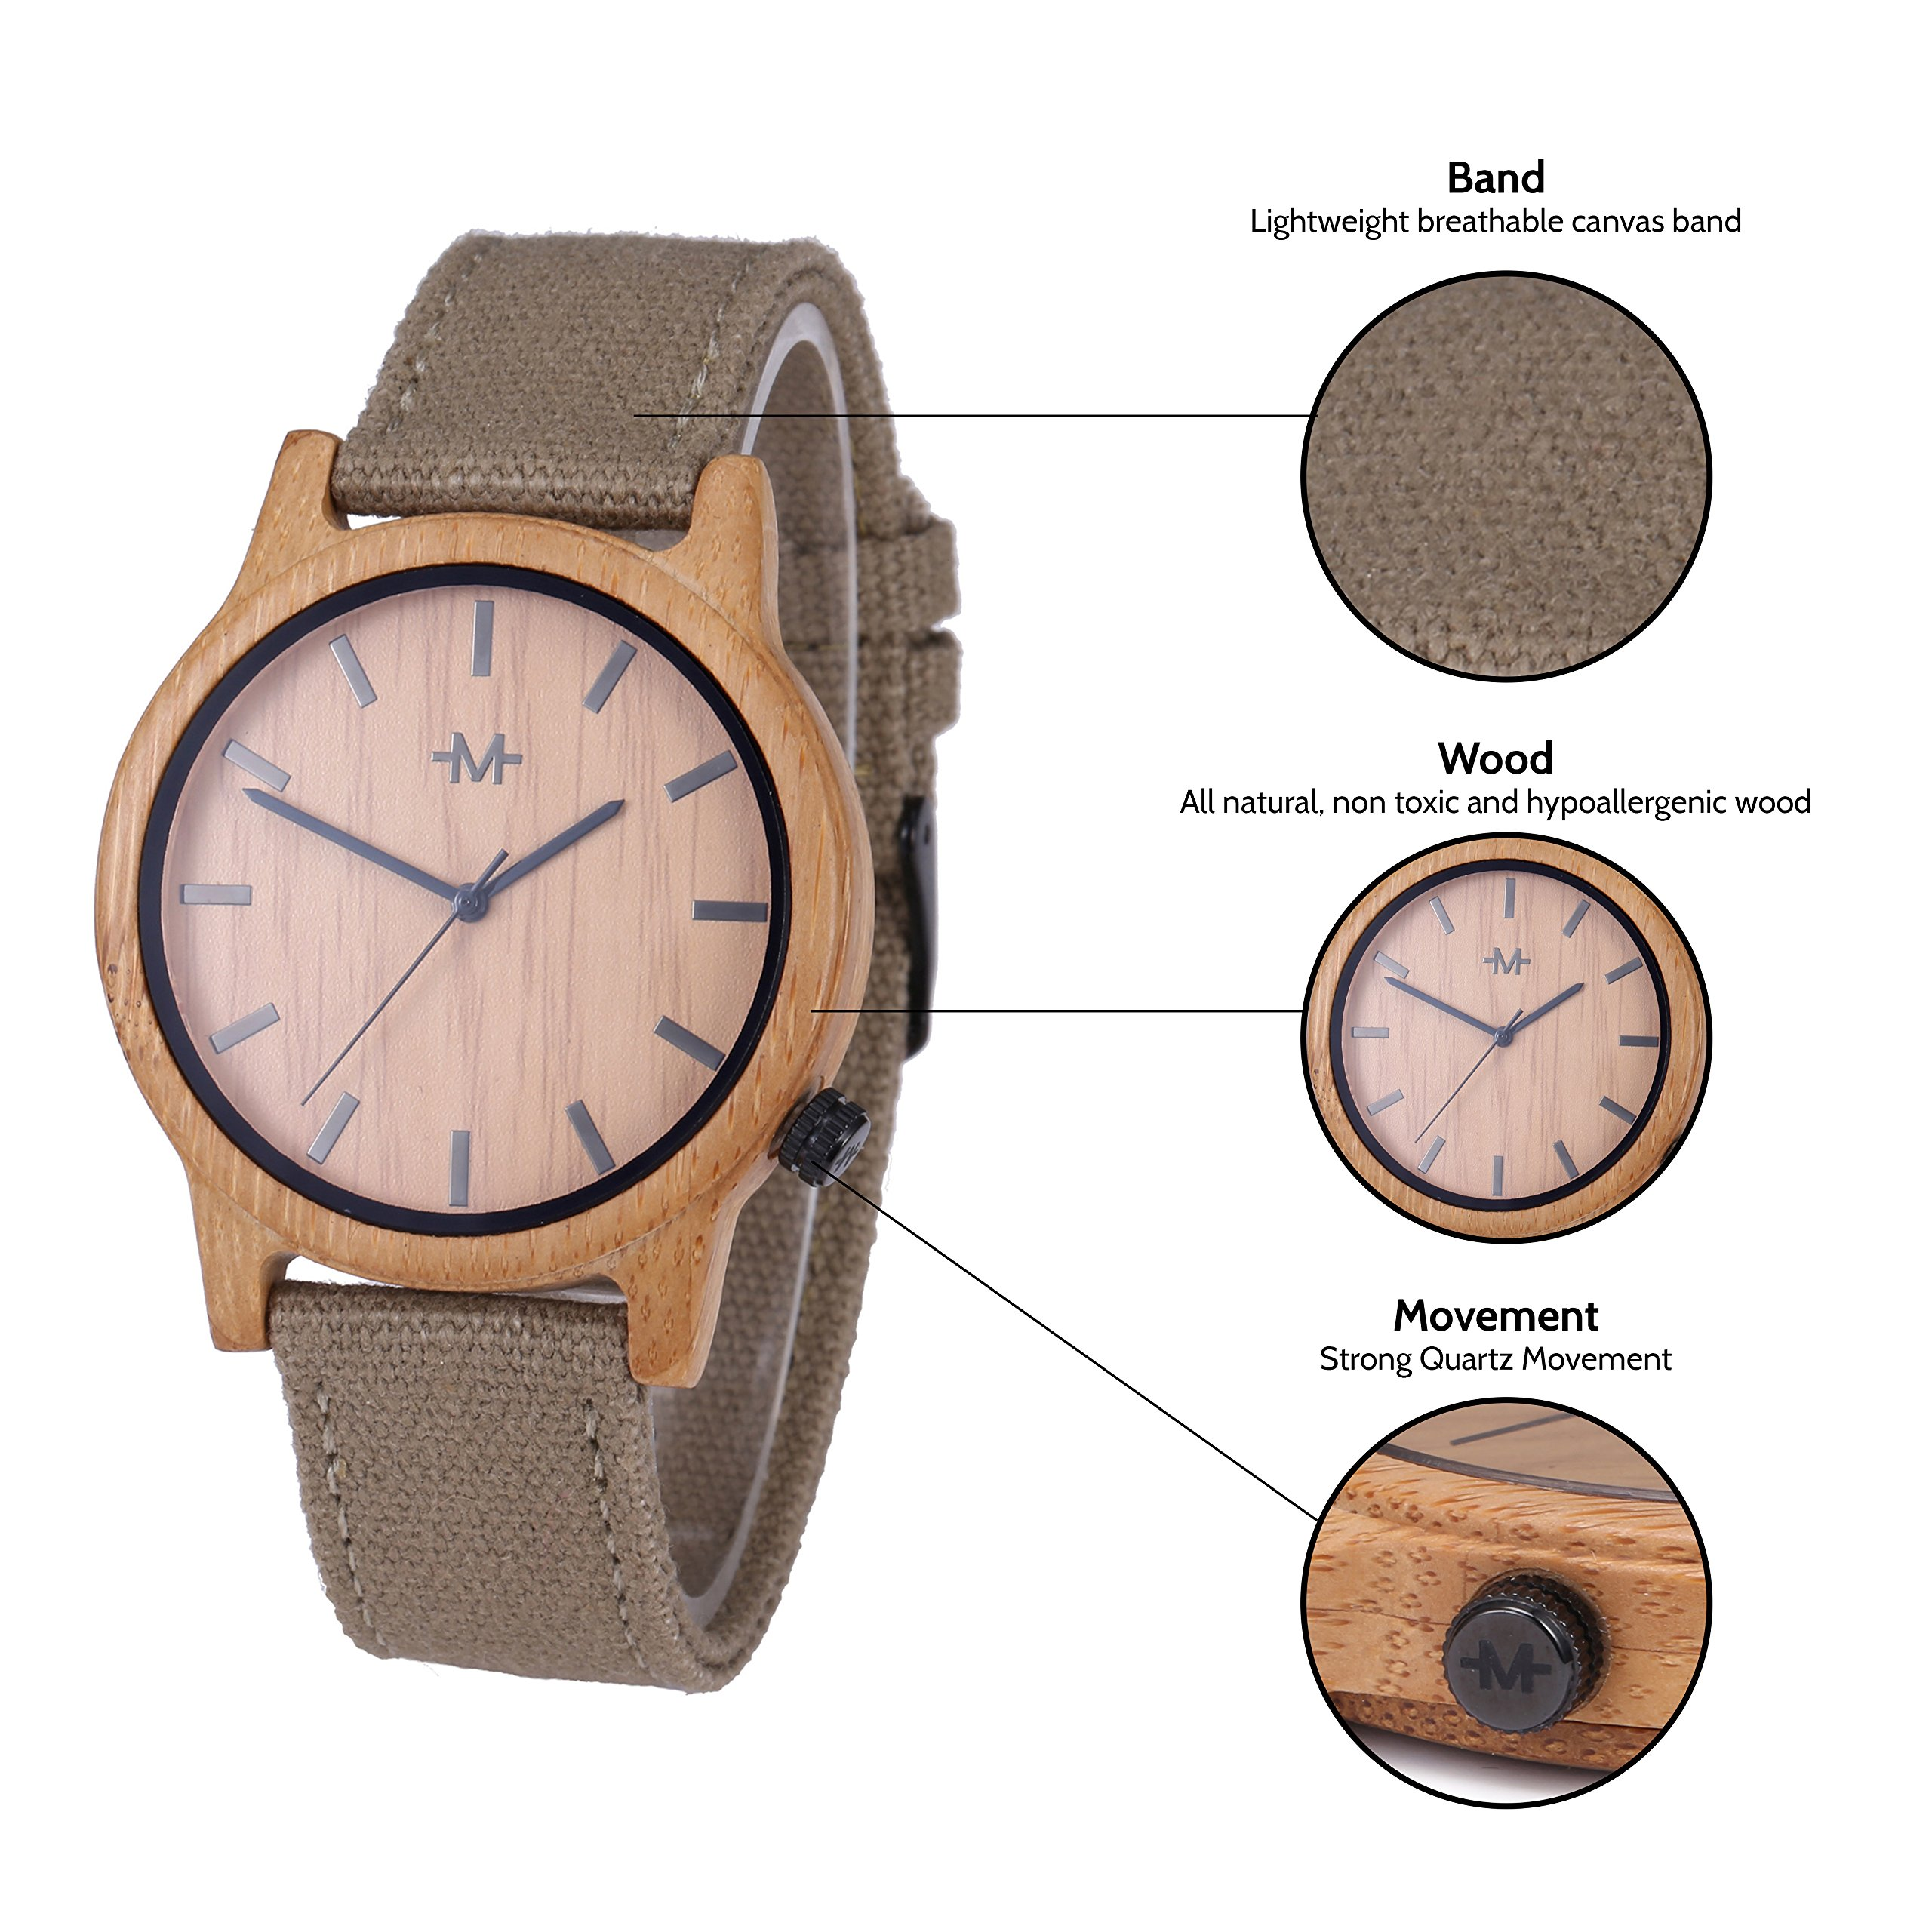 Marino Mens Wooden Watch - Wrist watches for Men - Dress Wood Watch (One Size, Khaki - Canvas Band) by Marino Avenue (Image #3)